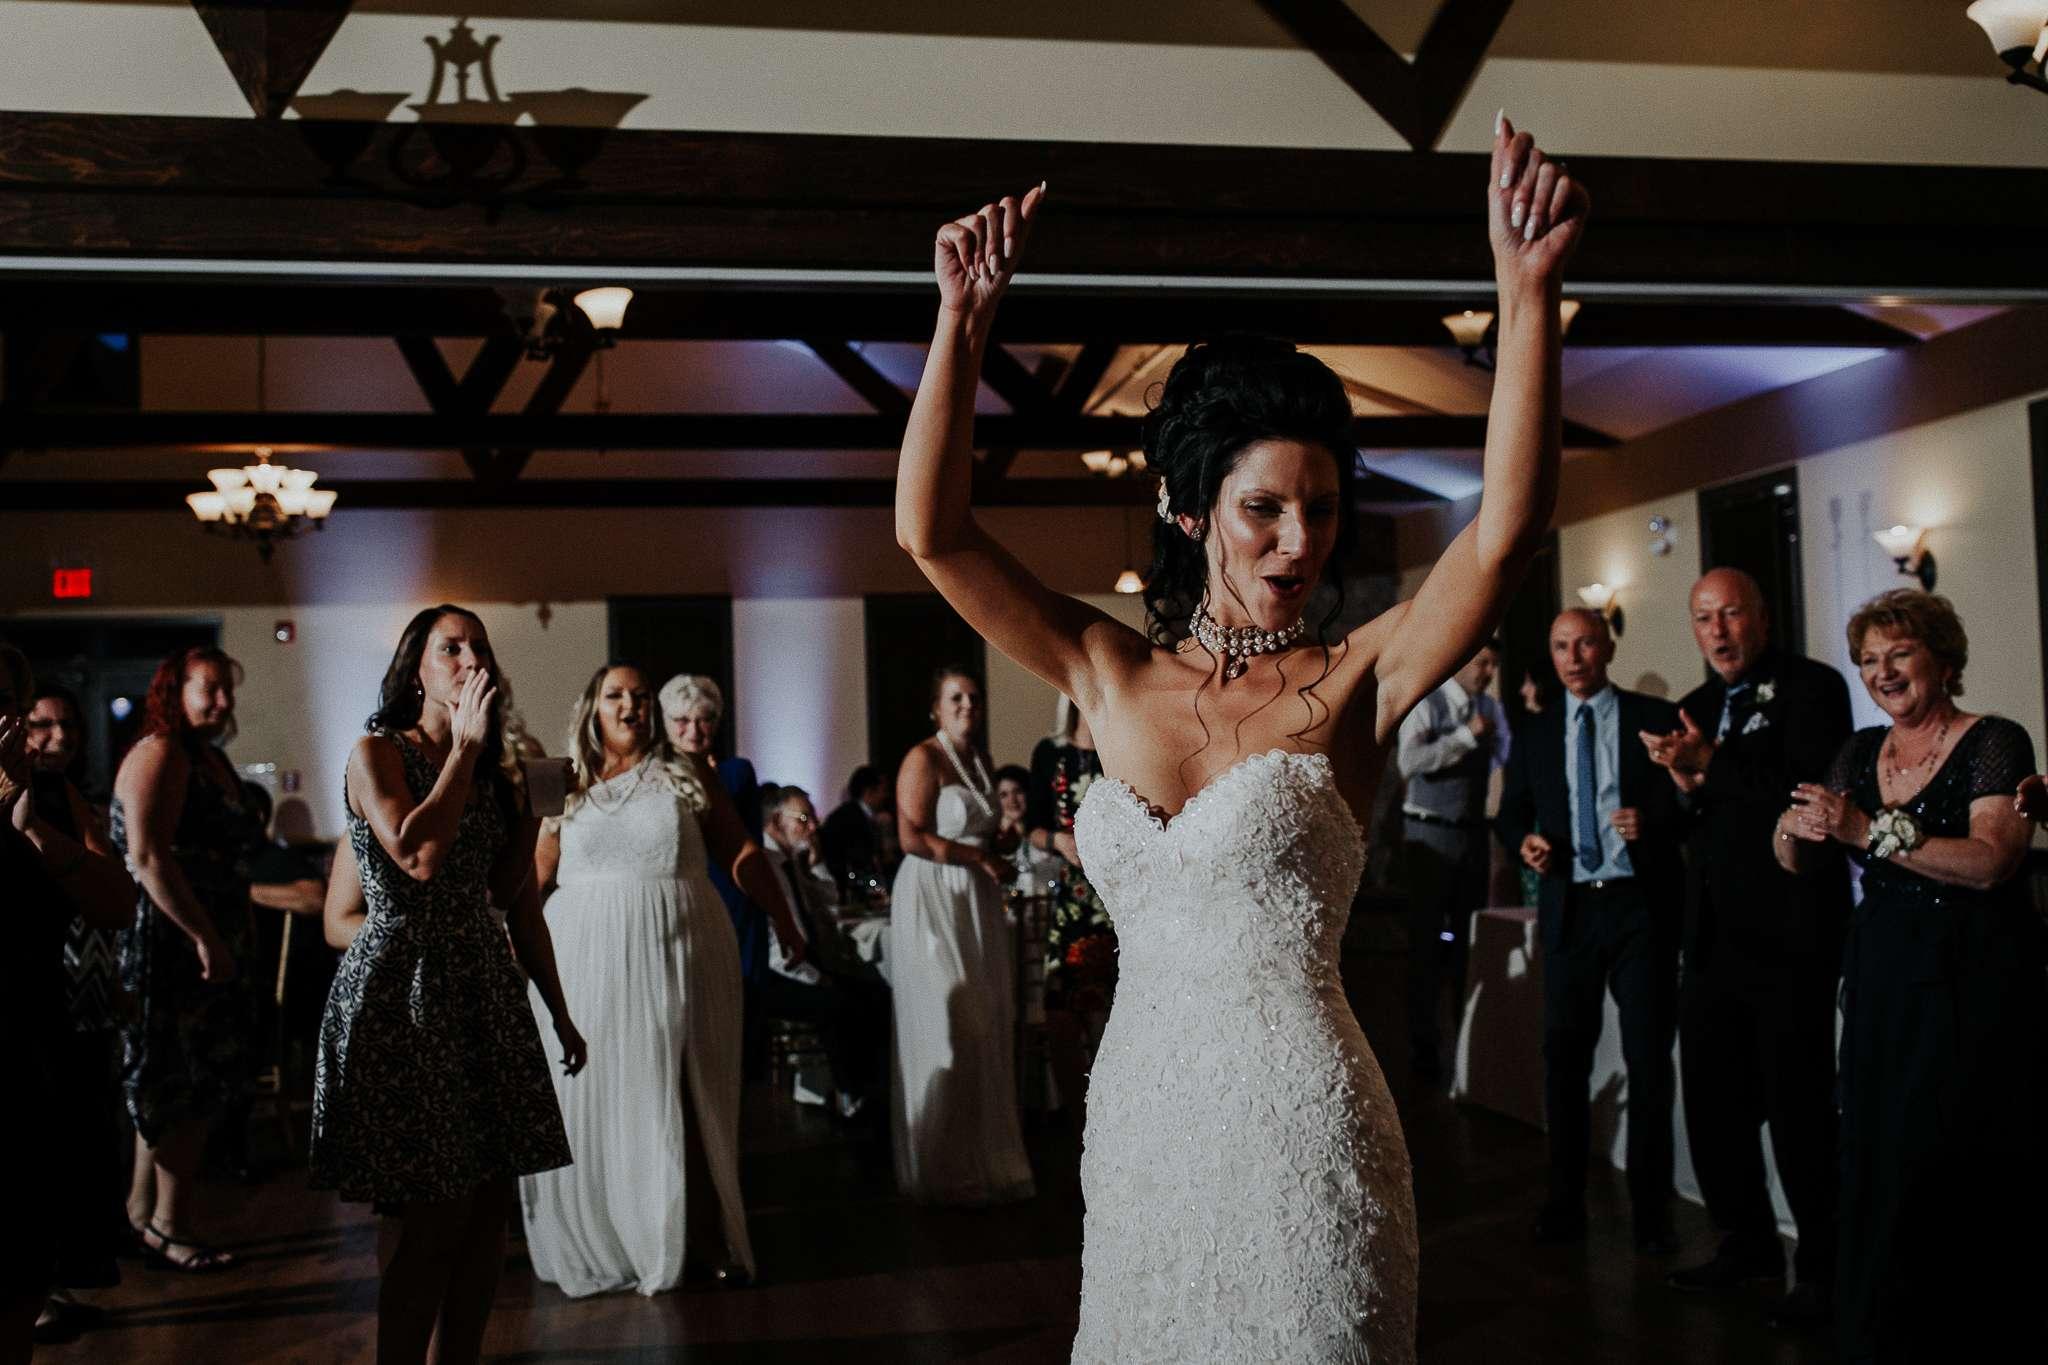 Bar None Ranches Wedding,calgary wedding photographer,cranston community hall,dewinton hall,wedding photographers calgary,